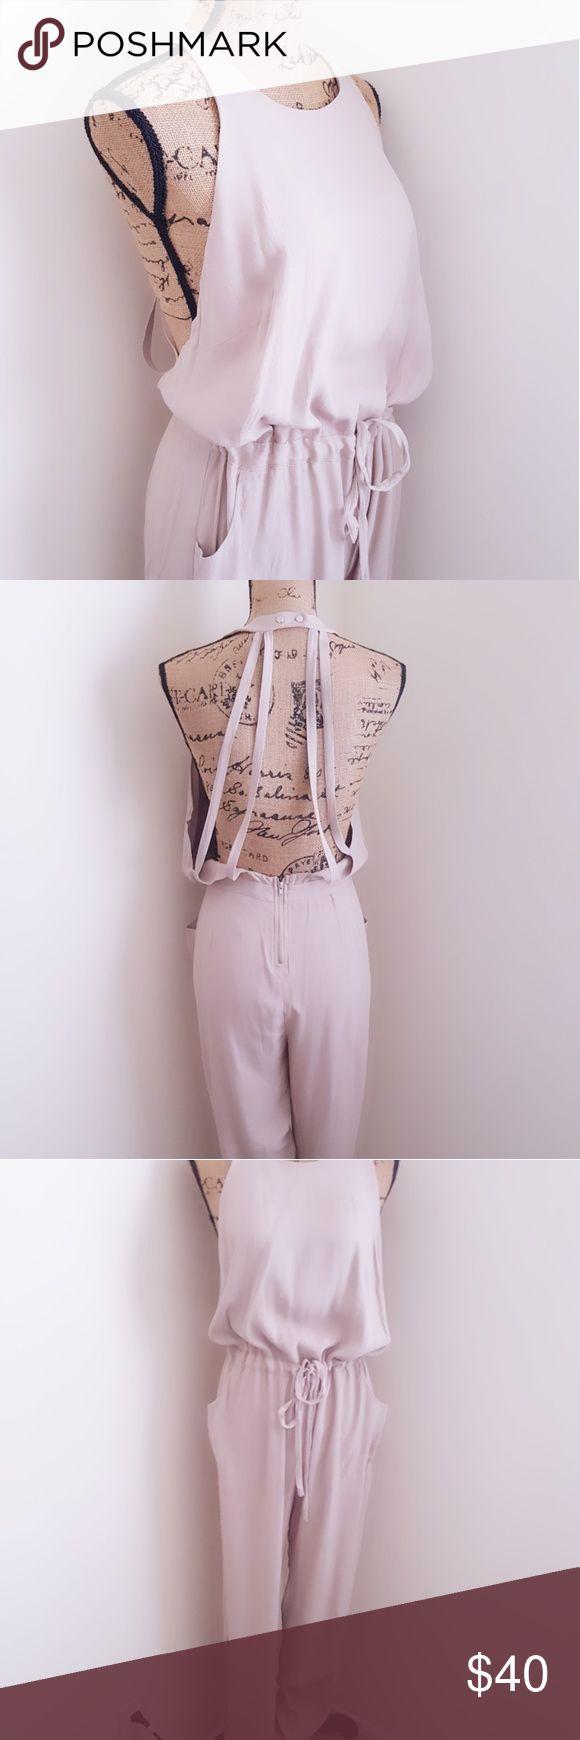 Nude Jumpsuit New  Size Large Pants Jumpsuits & Rompers